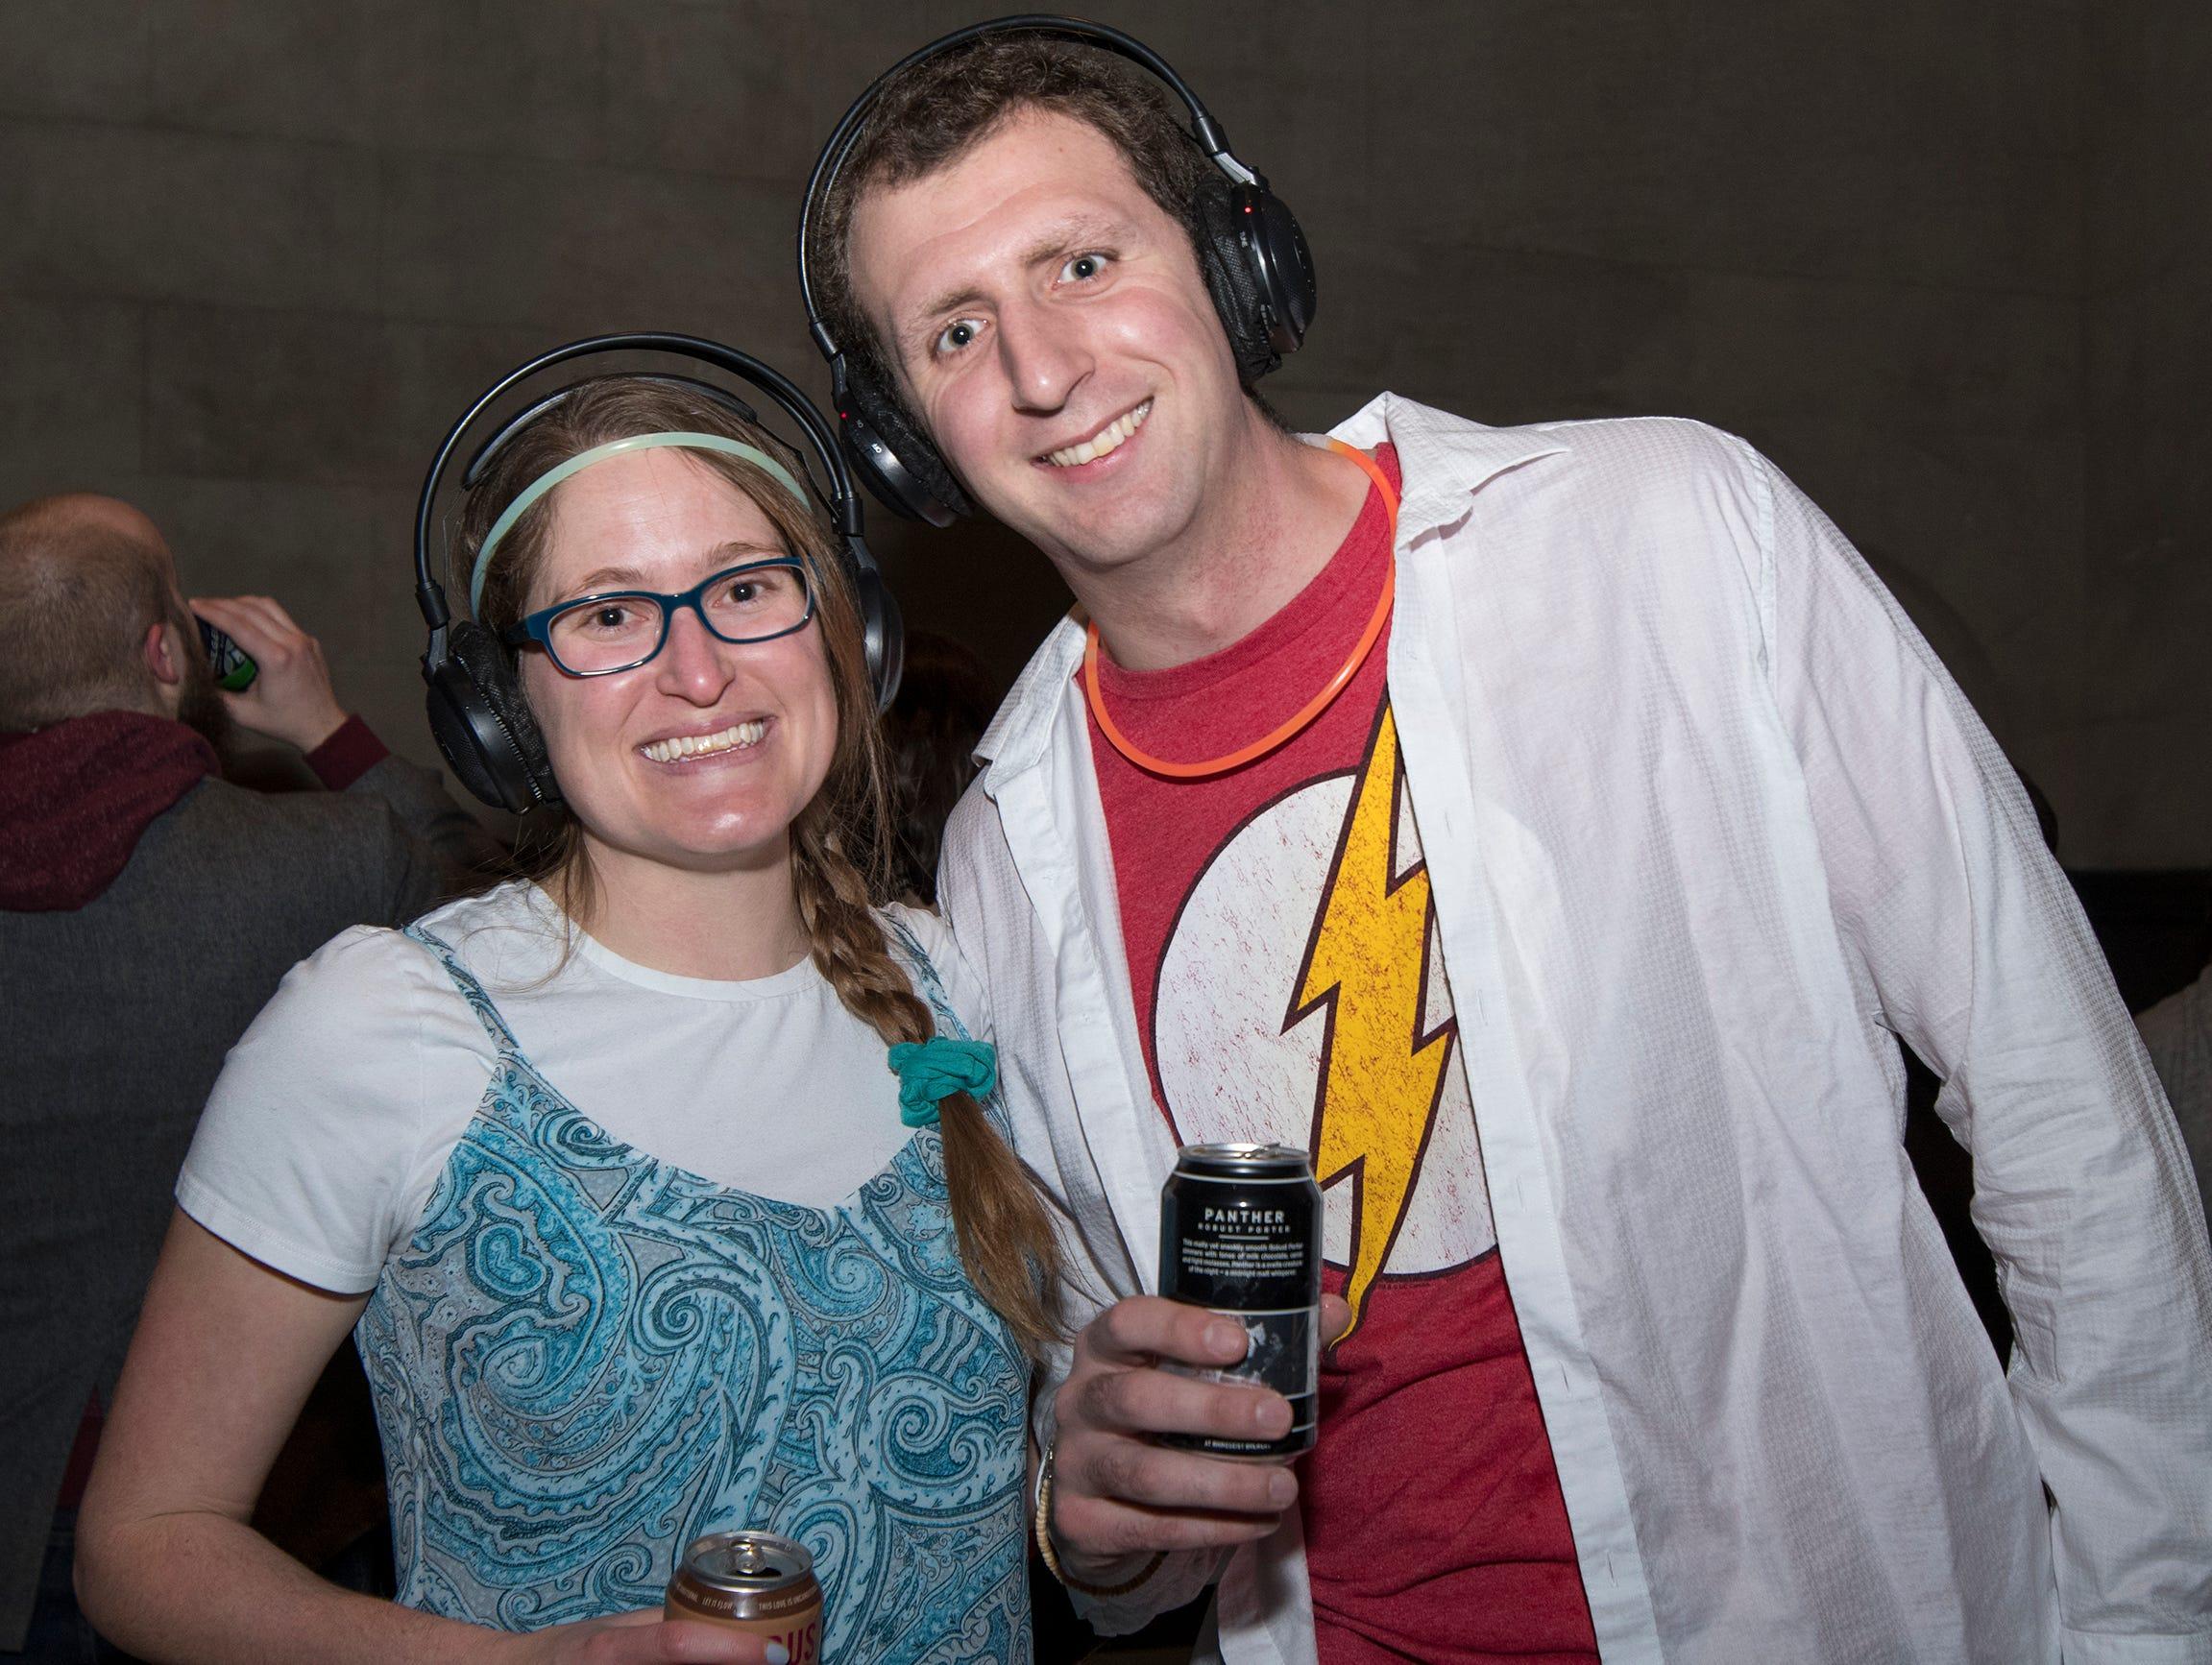 Jennifer and Matt Steinhardt of Mt. Adams attend a 90s-themed silent disco during Art After Dark at the Cincinnati Art Museum Friday, January 25, 2019 in Cincinnati, Ohio.